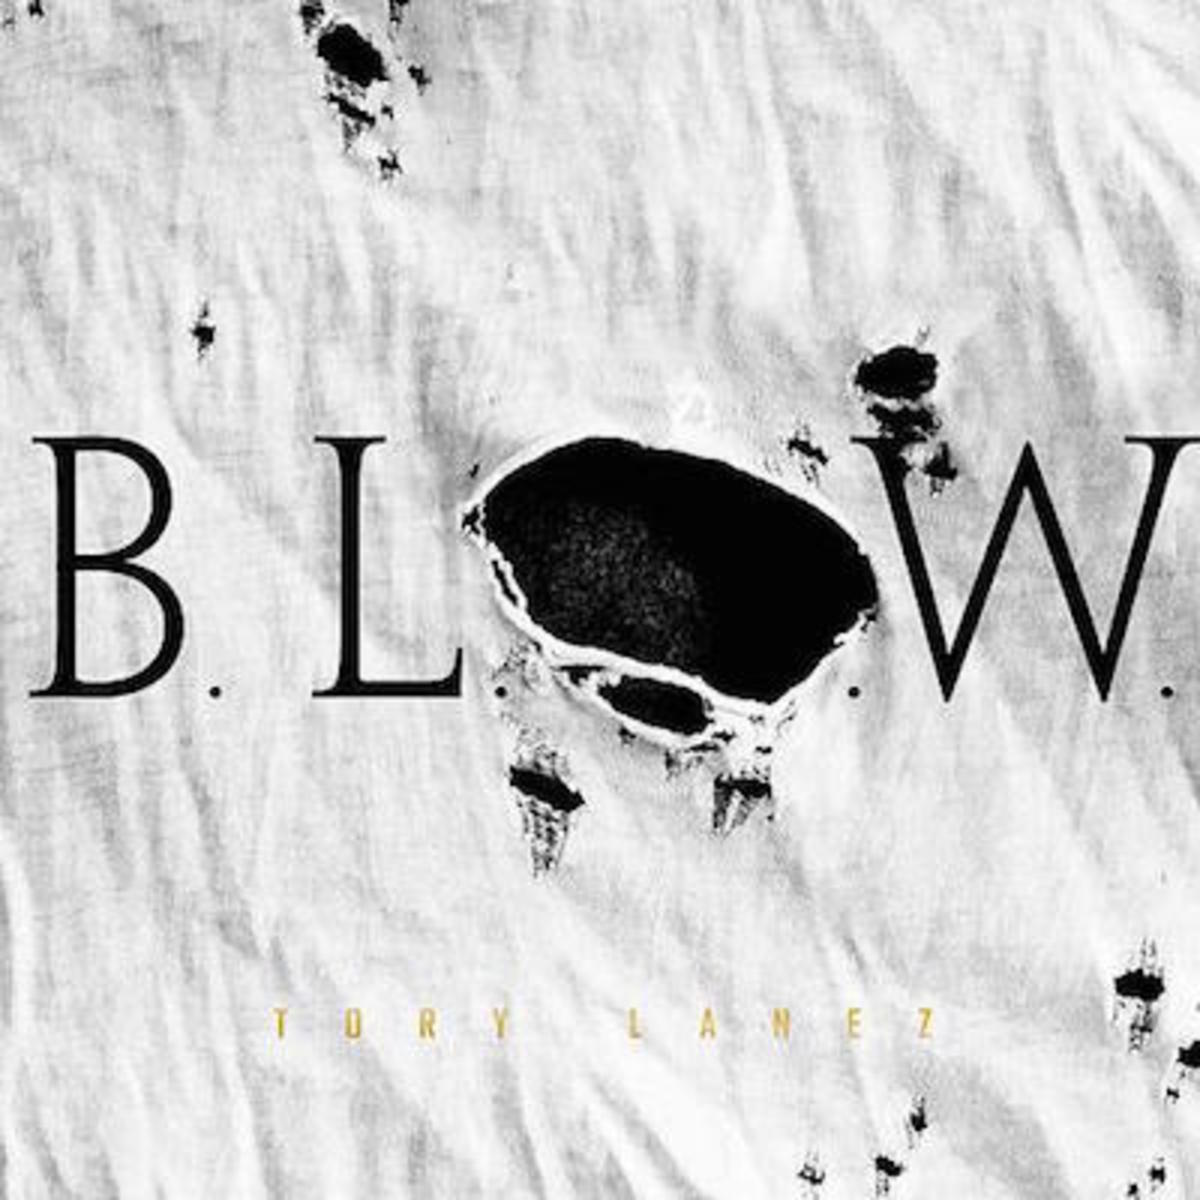 tory-lanez-blow.jpg